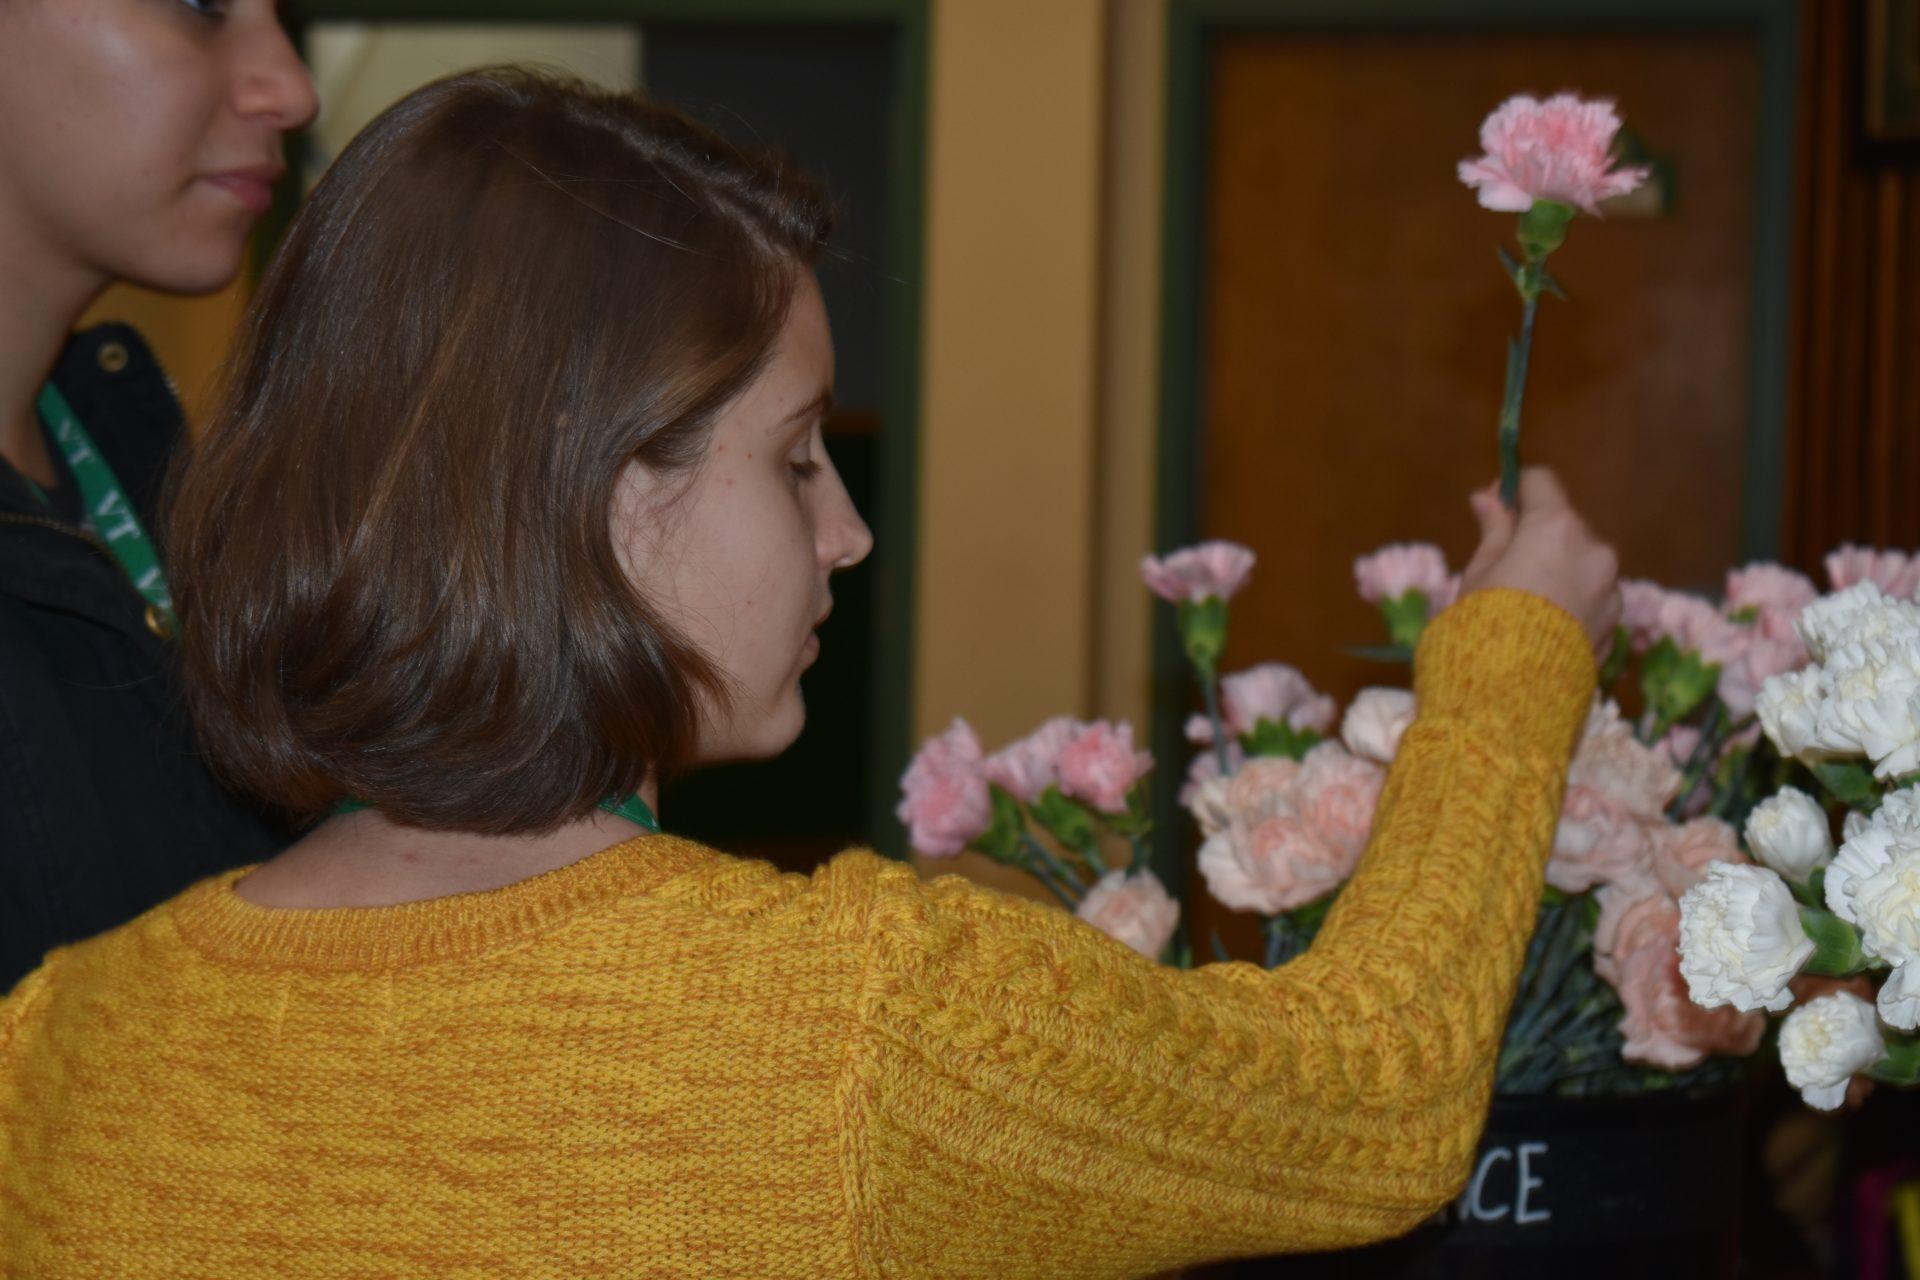 holding pink flower